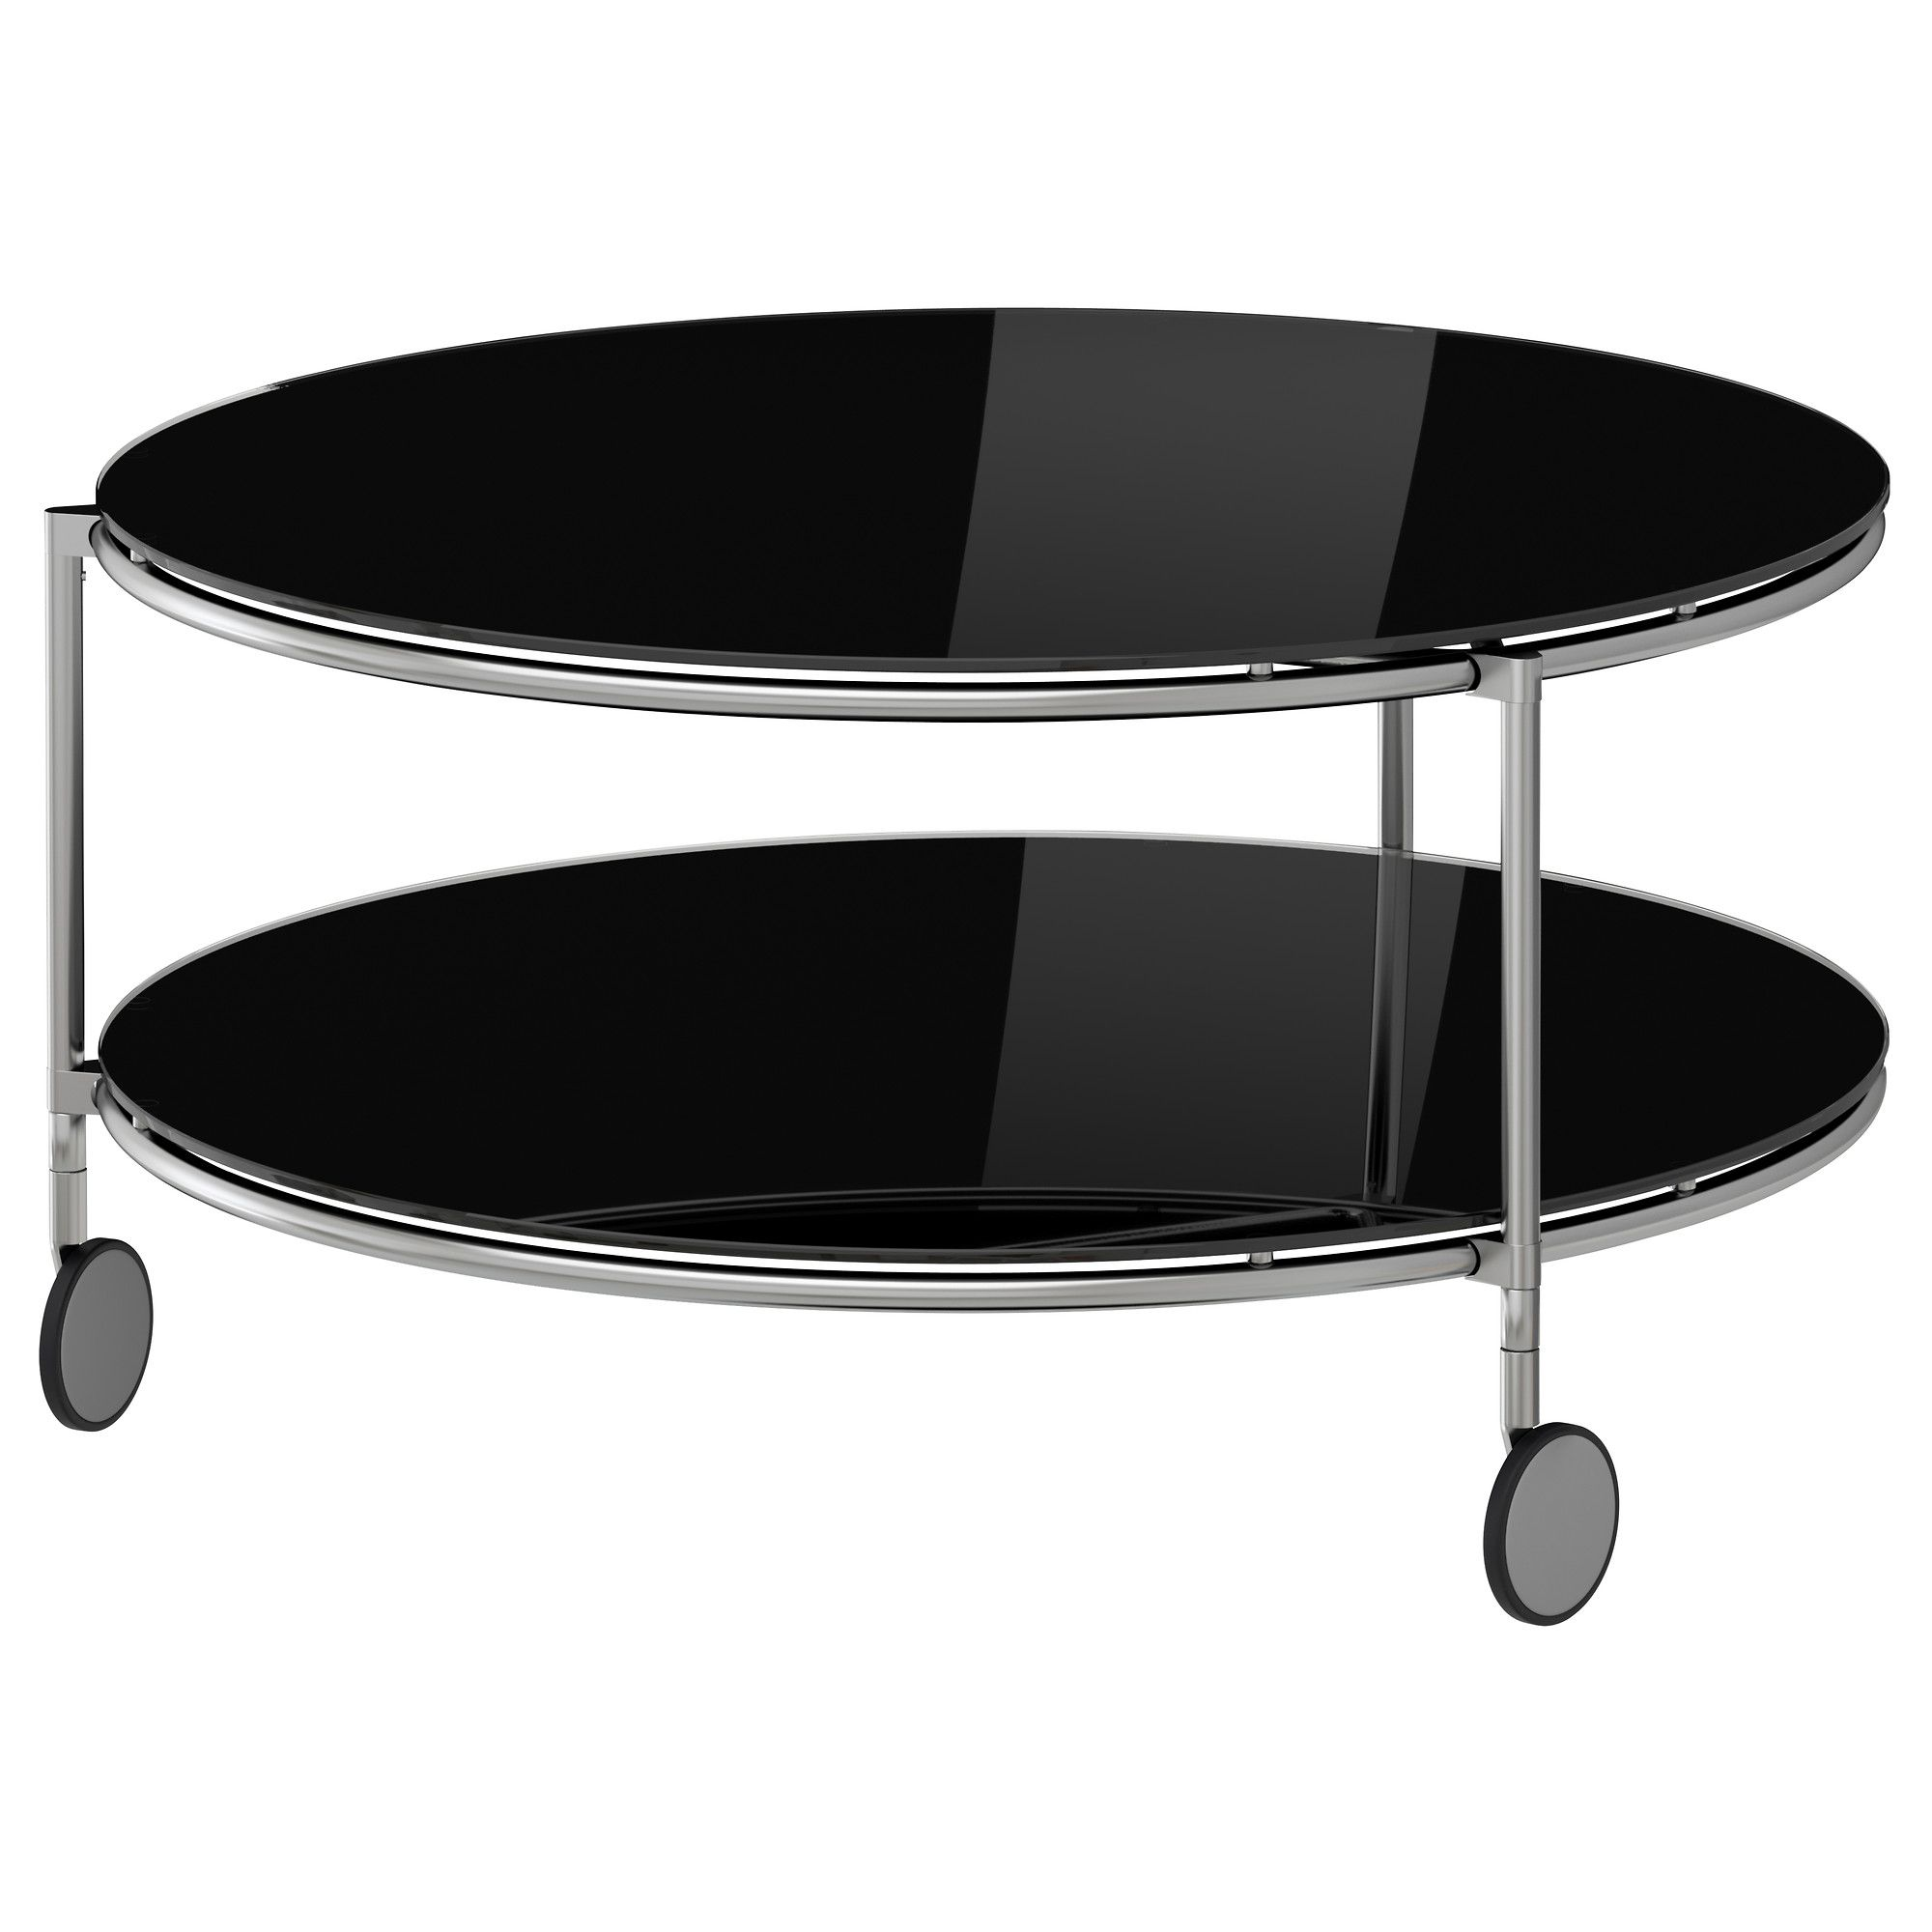 STRIND Coffee Table Blacknickel Plated IKEA - Strind coffee table